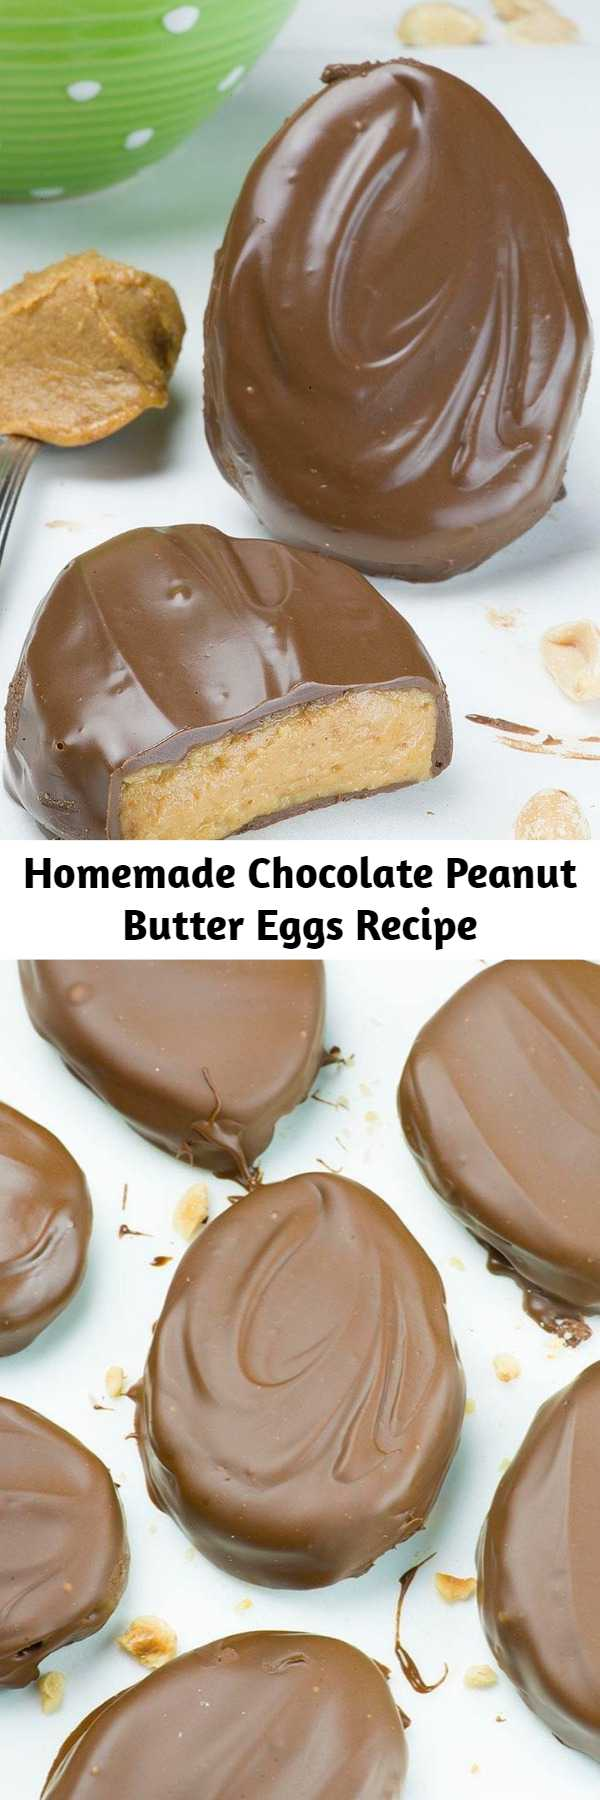 Homemade Chocolate Peanut Butter Eggs Recipe